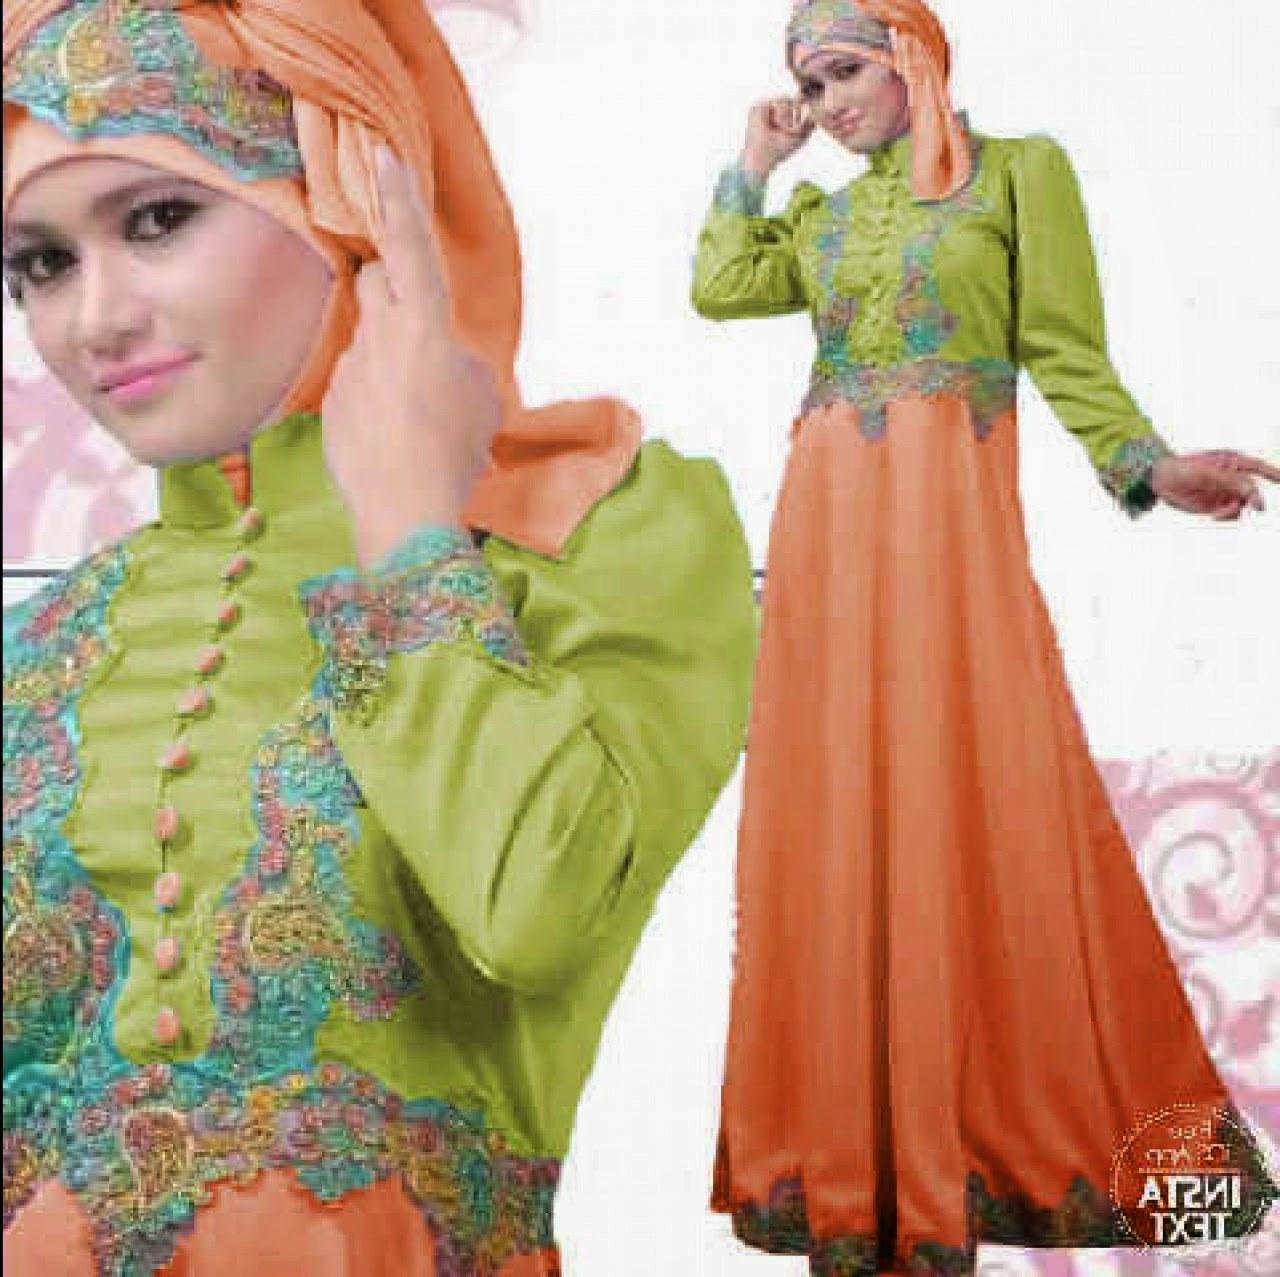 Bentuk Fashion Baju Lebaran H9d9 Kumpulan Foto Model Baju Kebaya Lebaran Terbaru 2018